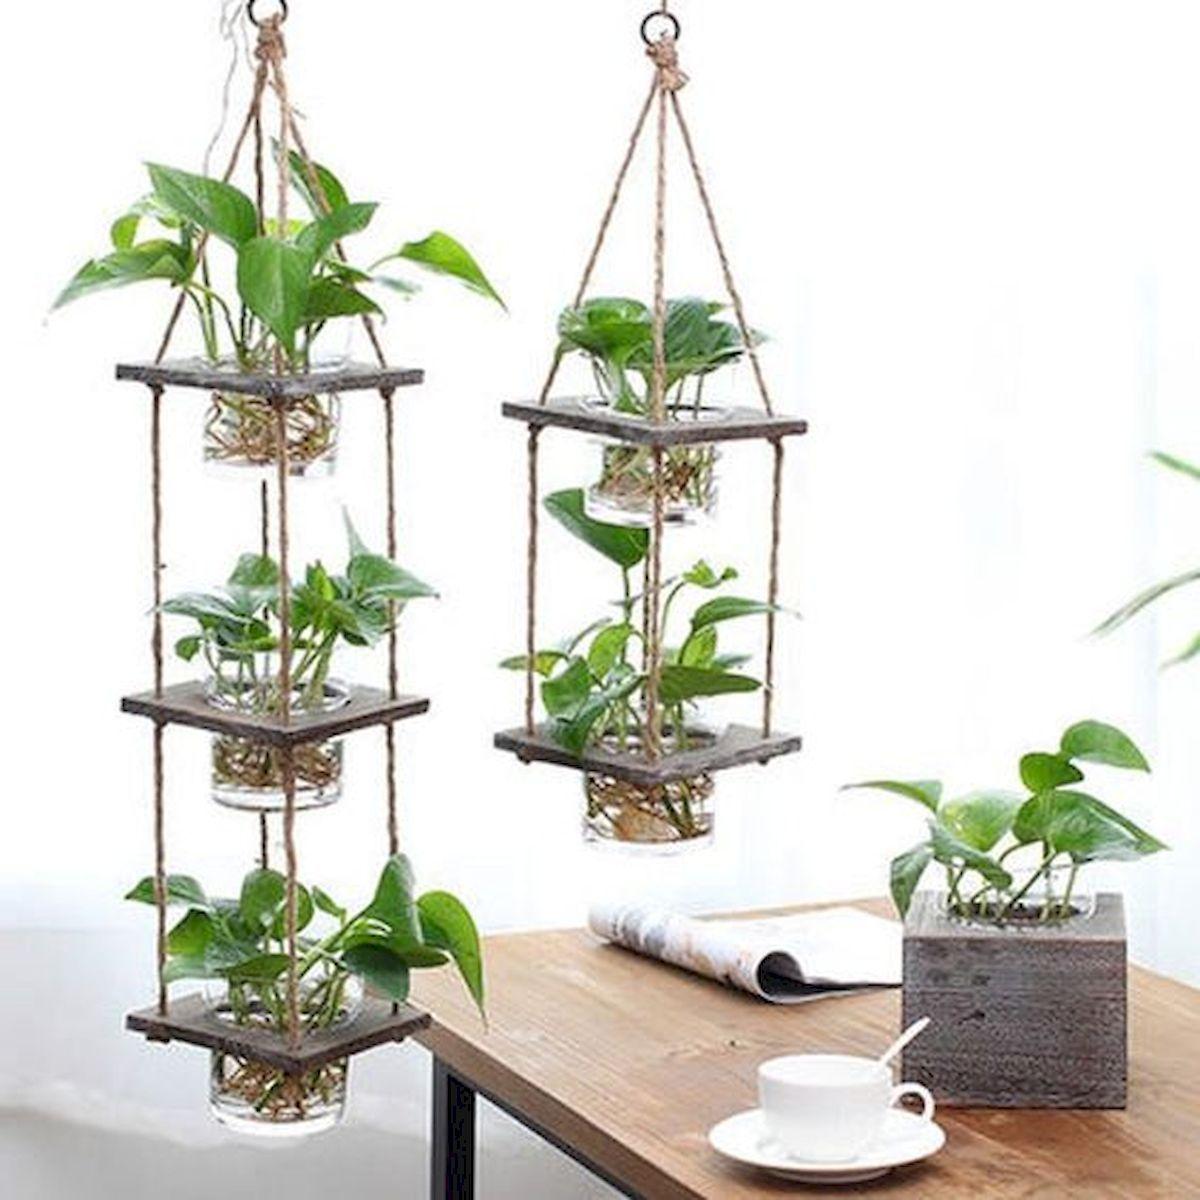 The Recent Trend Of Vertical Gardening Is Becoming